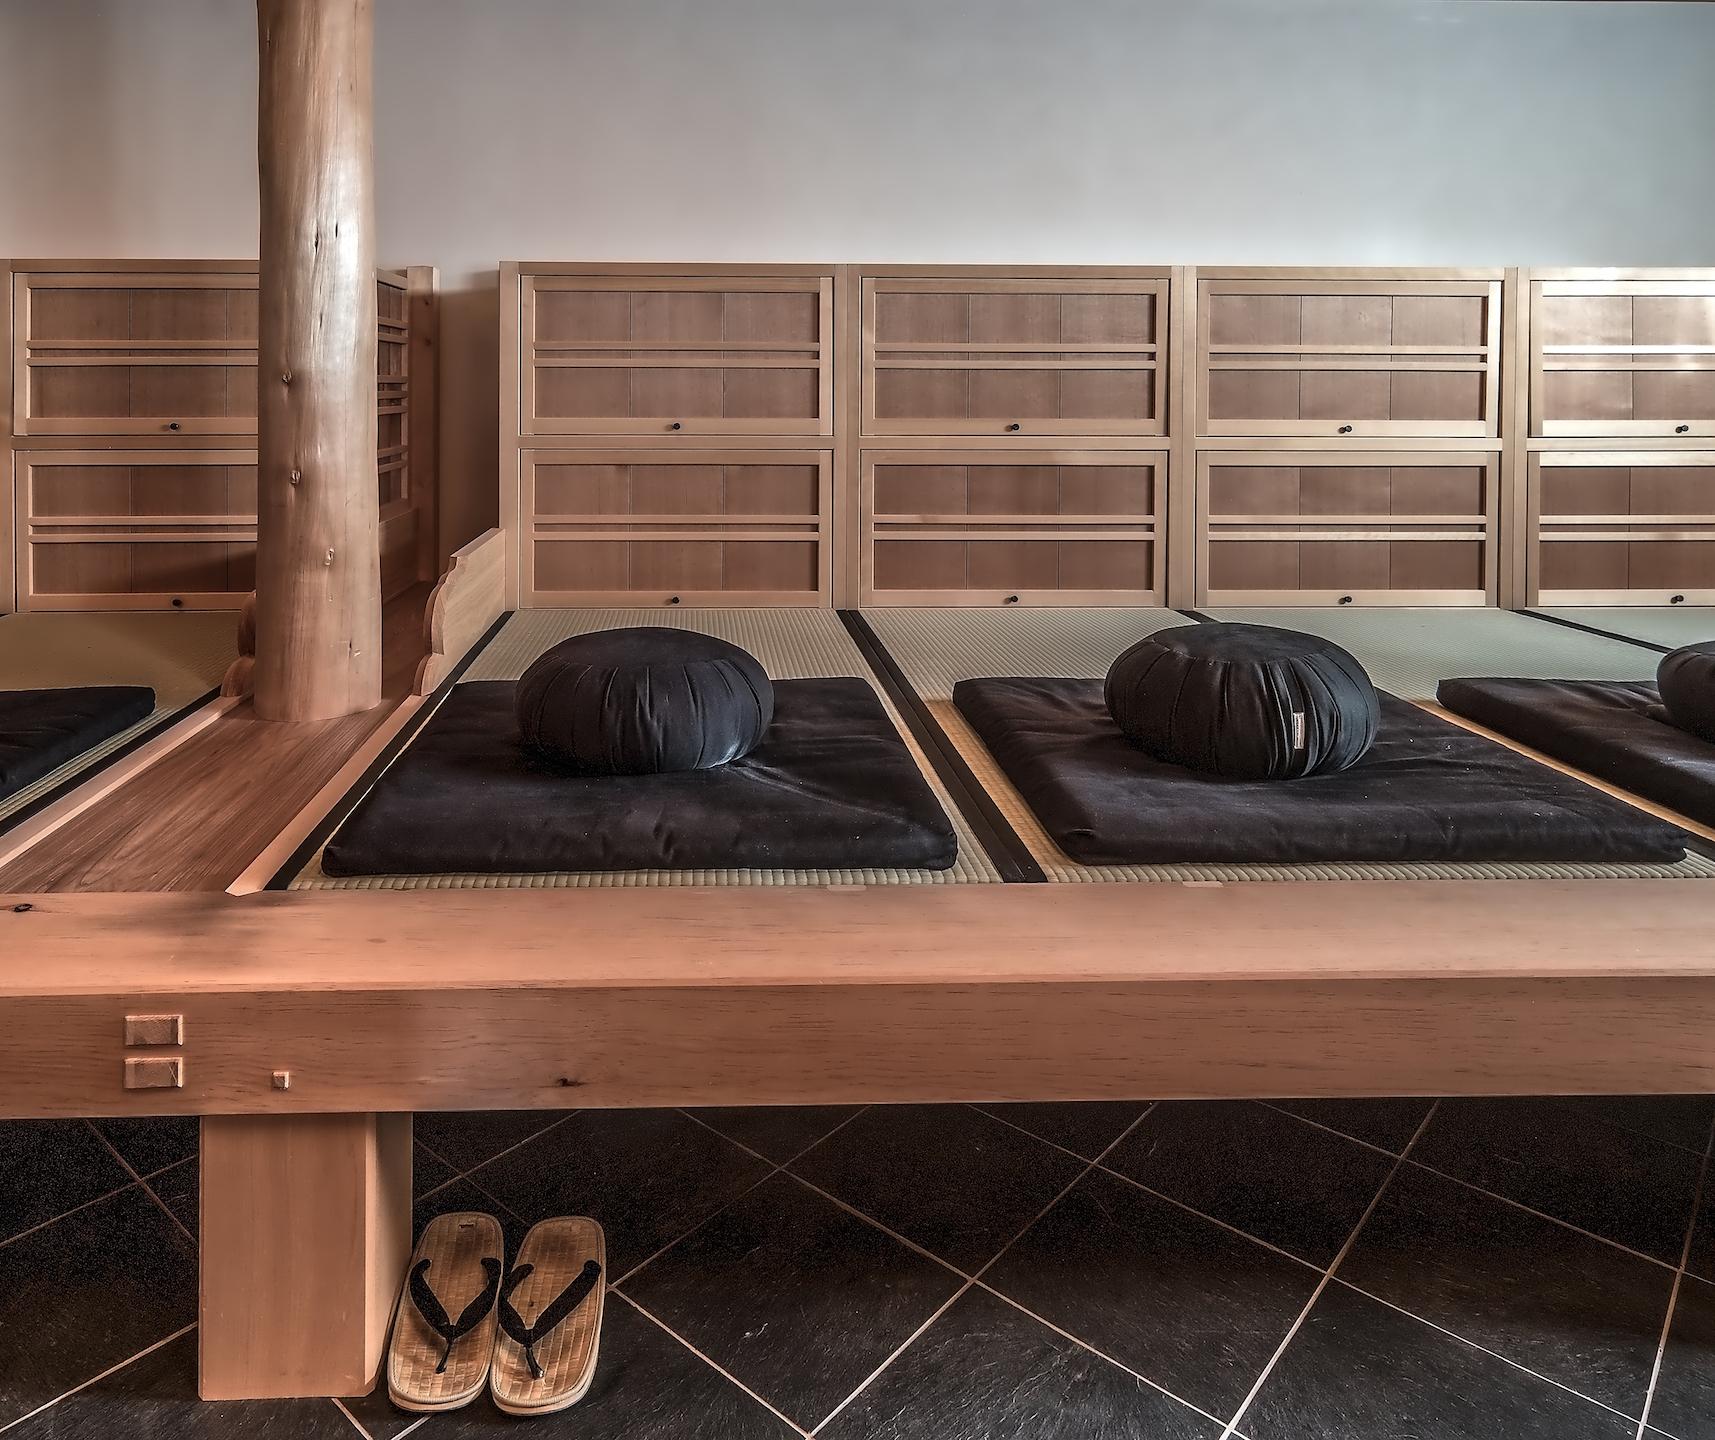 zen zazen meditation dharma sangha johanneshof buddhismus schwarzwald traditioneller japanischer Zendo meditationsplatz